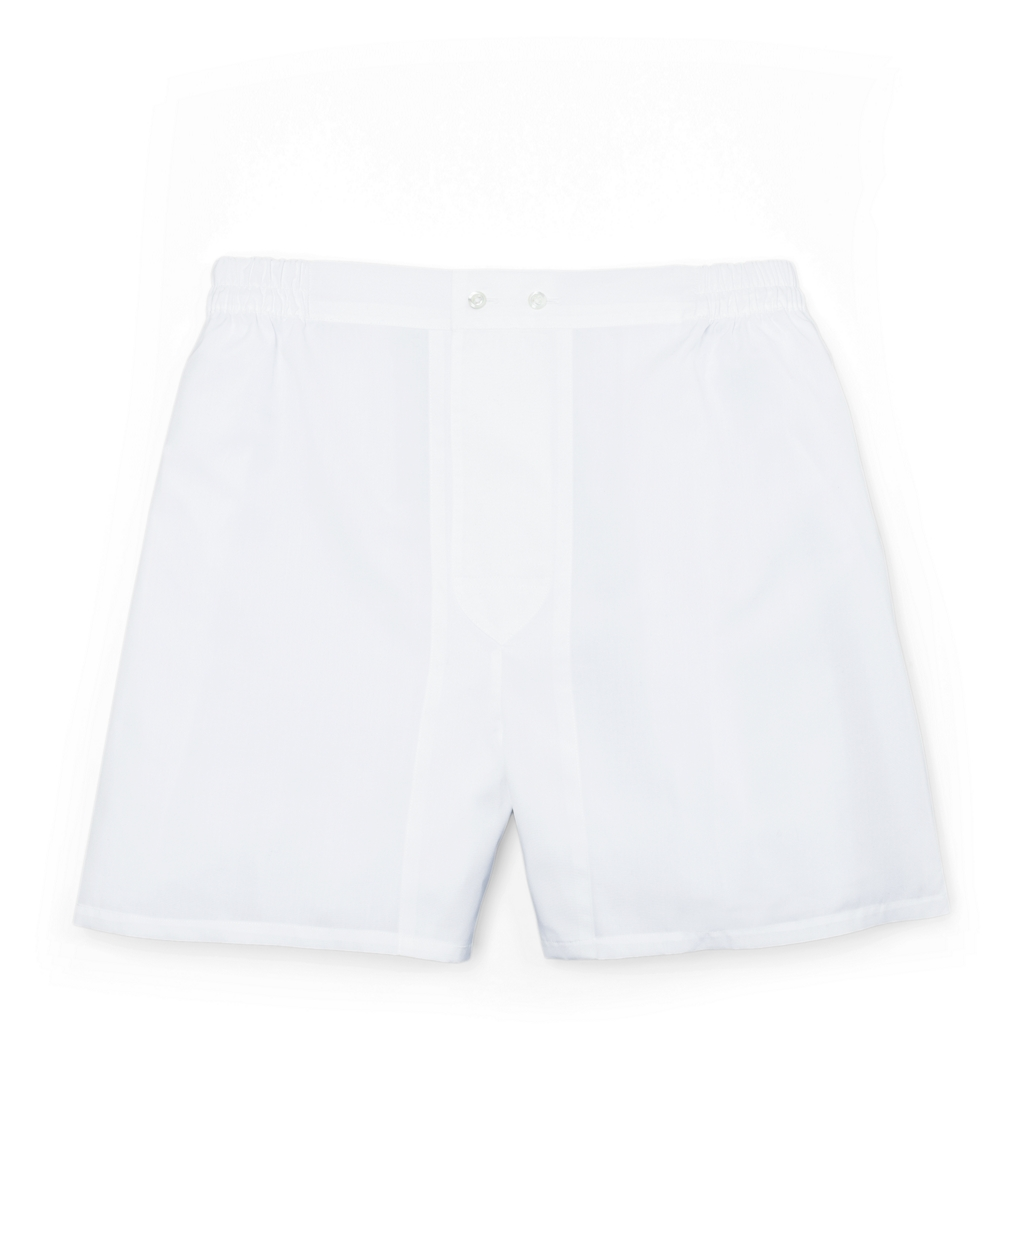 1940s Men's Underwear: Briefs, Boxers, Unions, & Socks Brooks Brothers Mens Luxury Boxers $31.50 AT vintagedancer.com